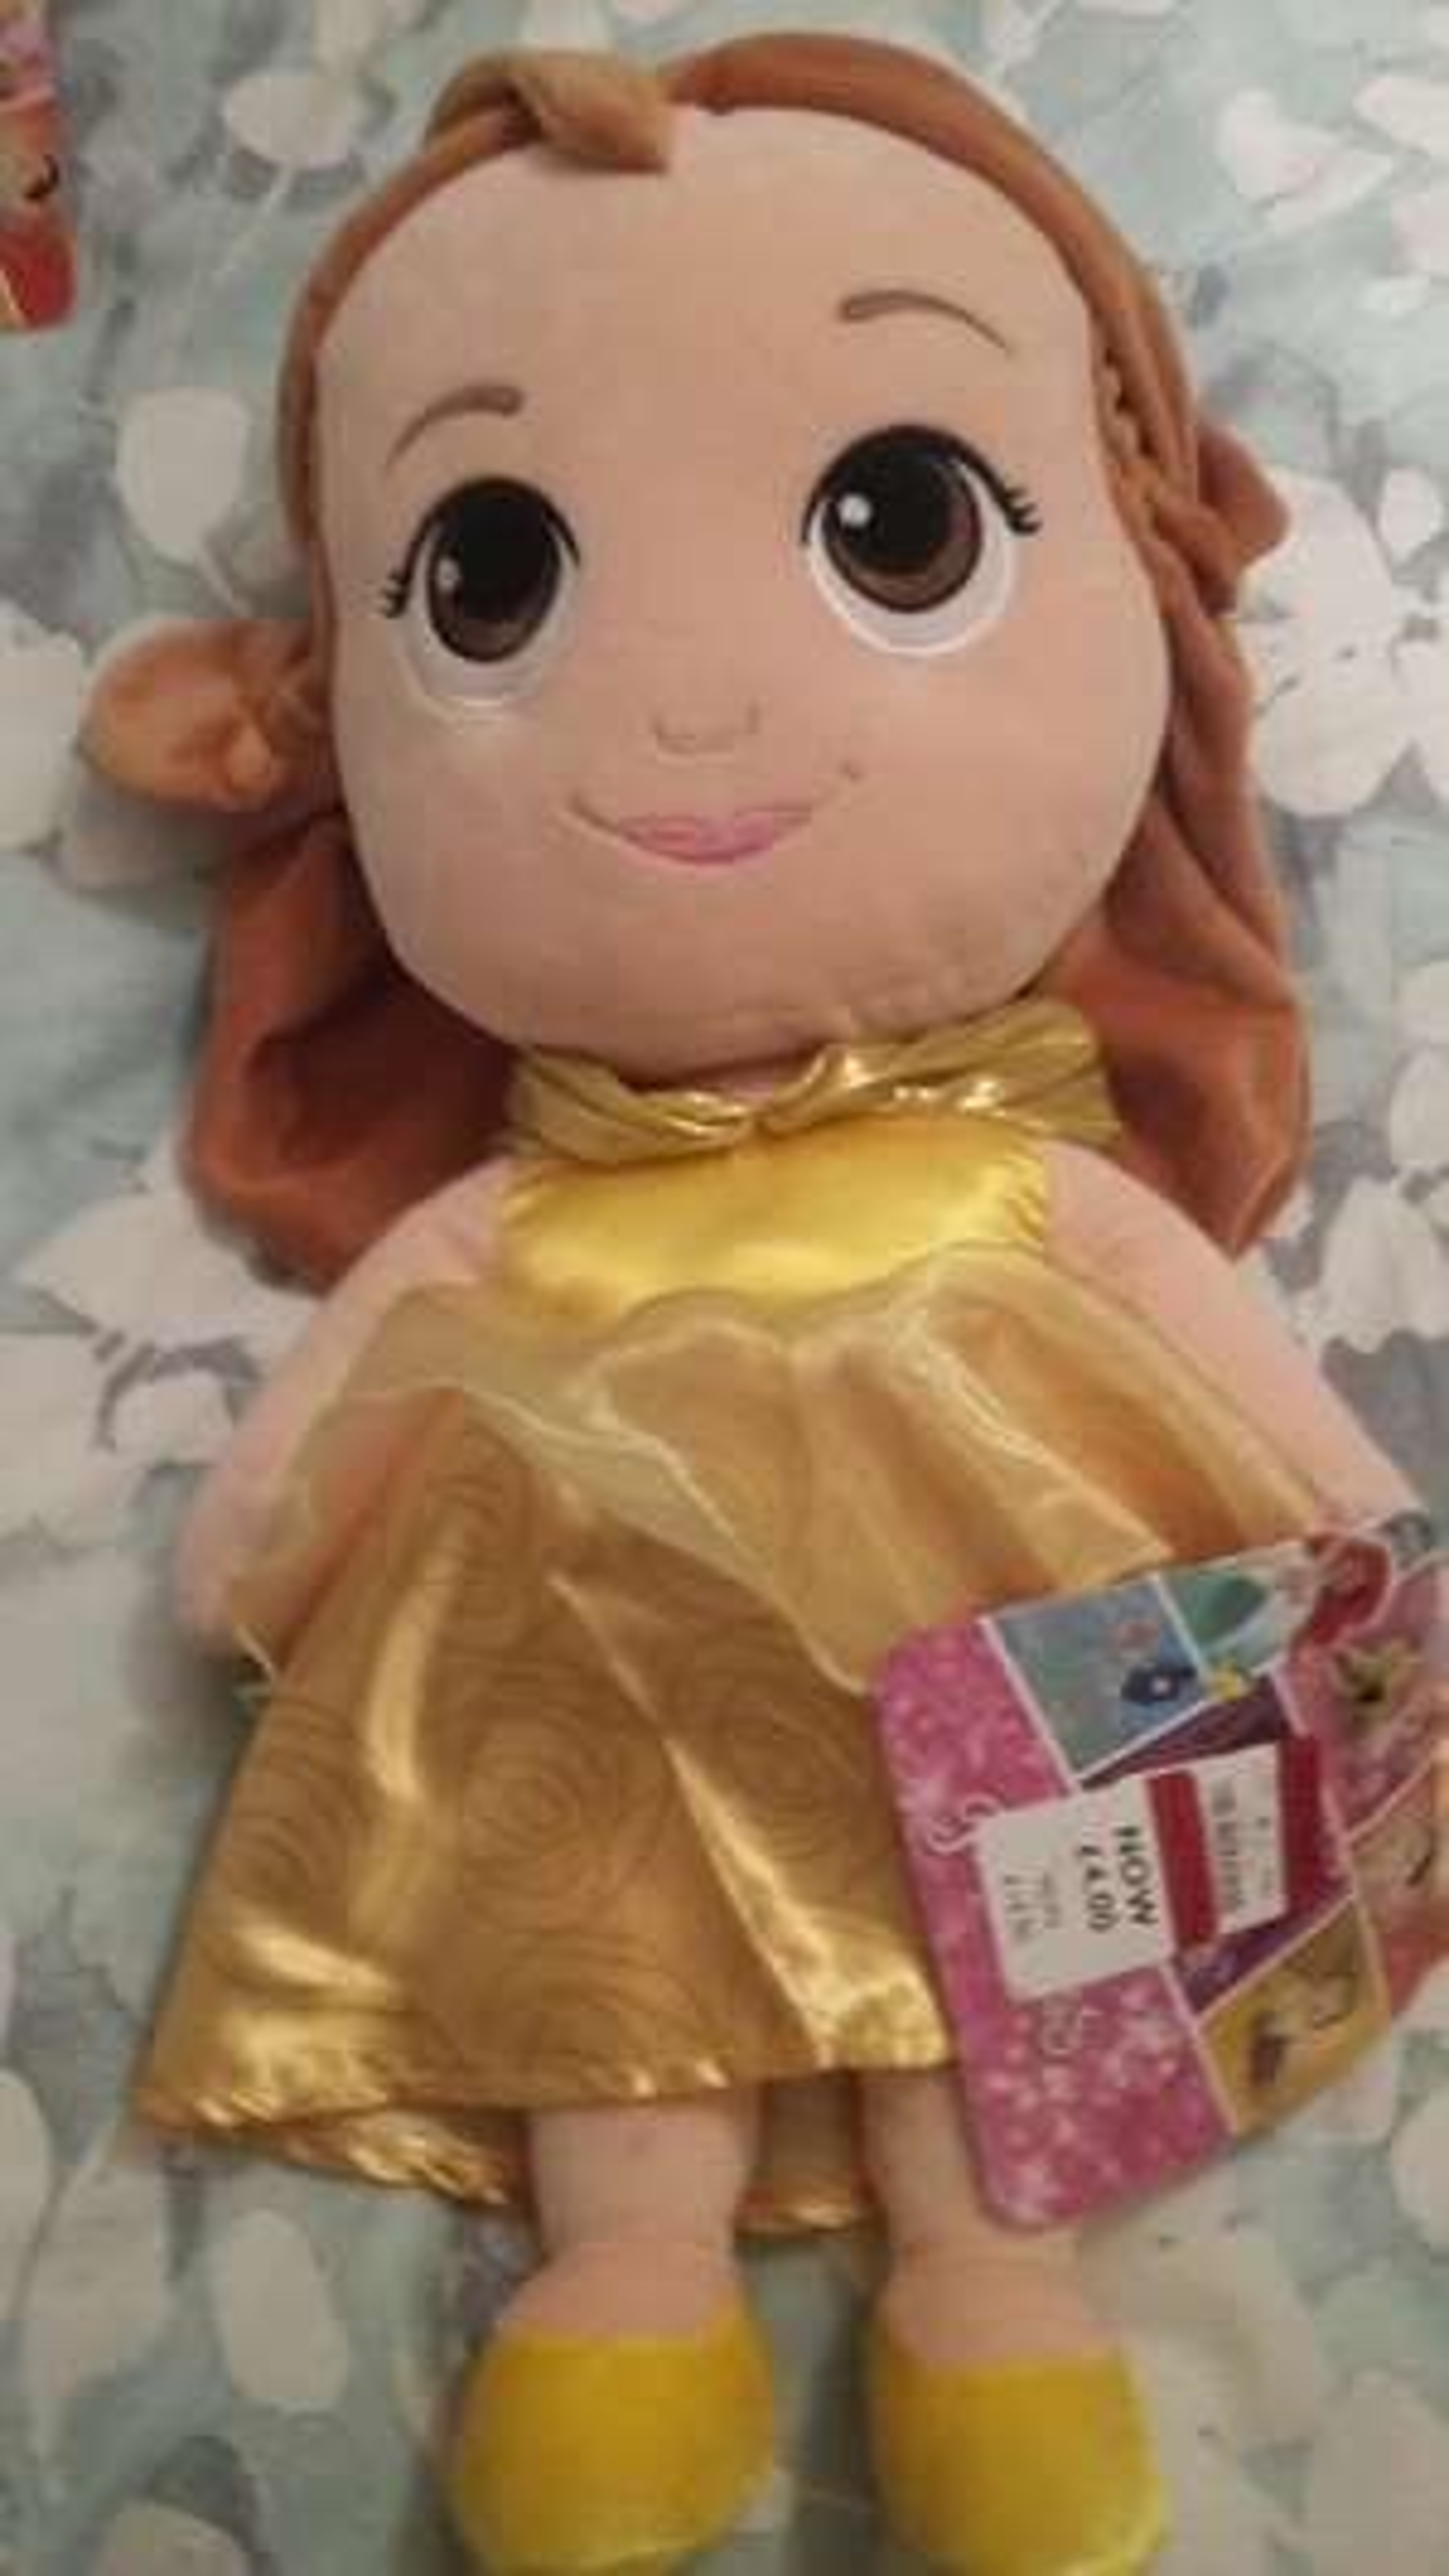 XL Soft Disney Princess Belle Doll Debenhams Livingston- for £4